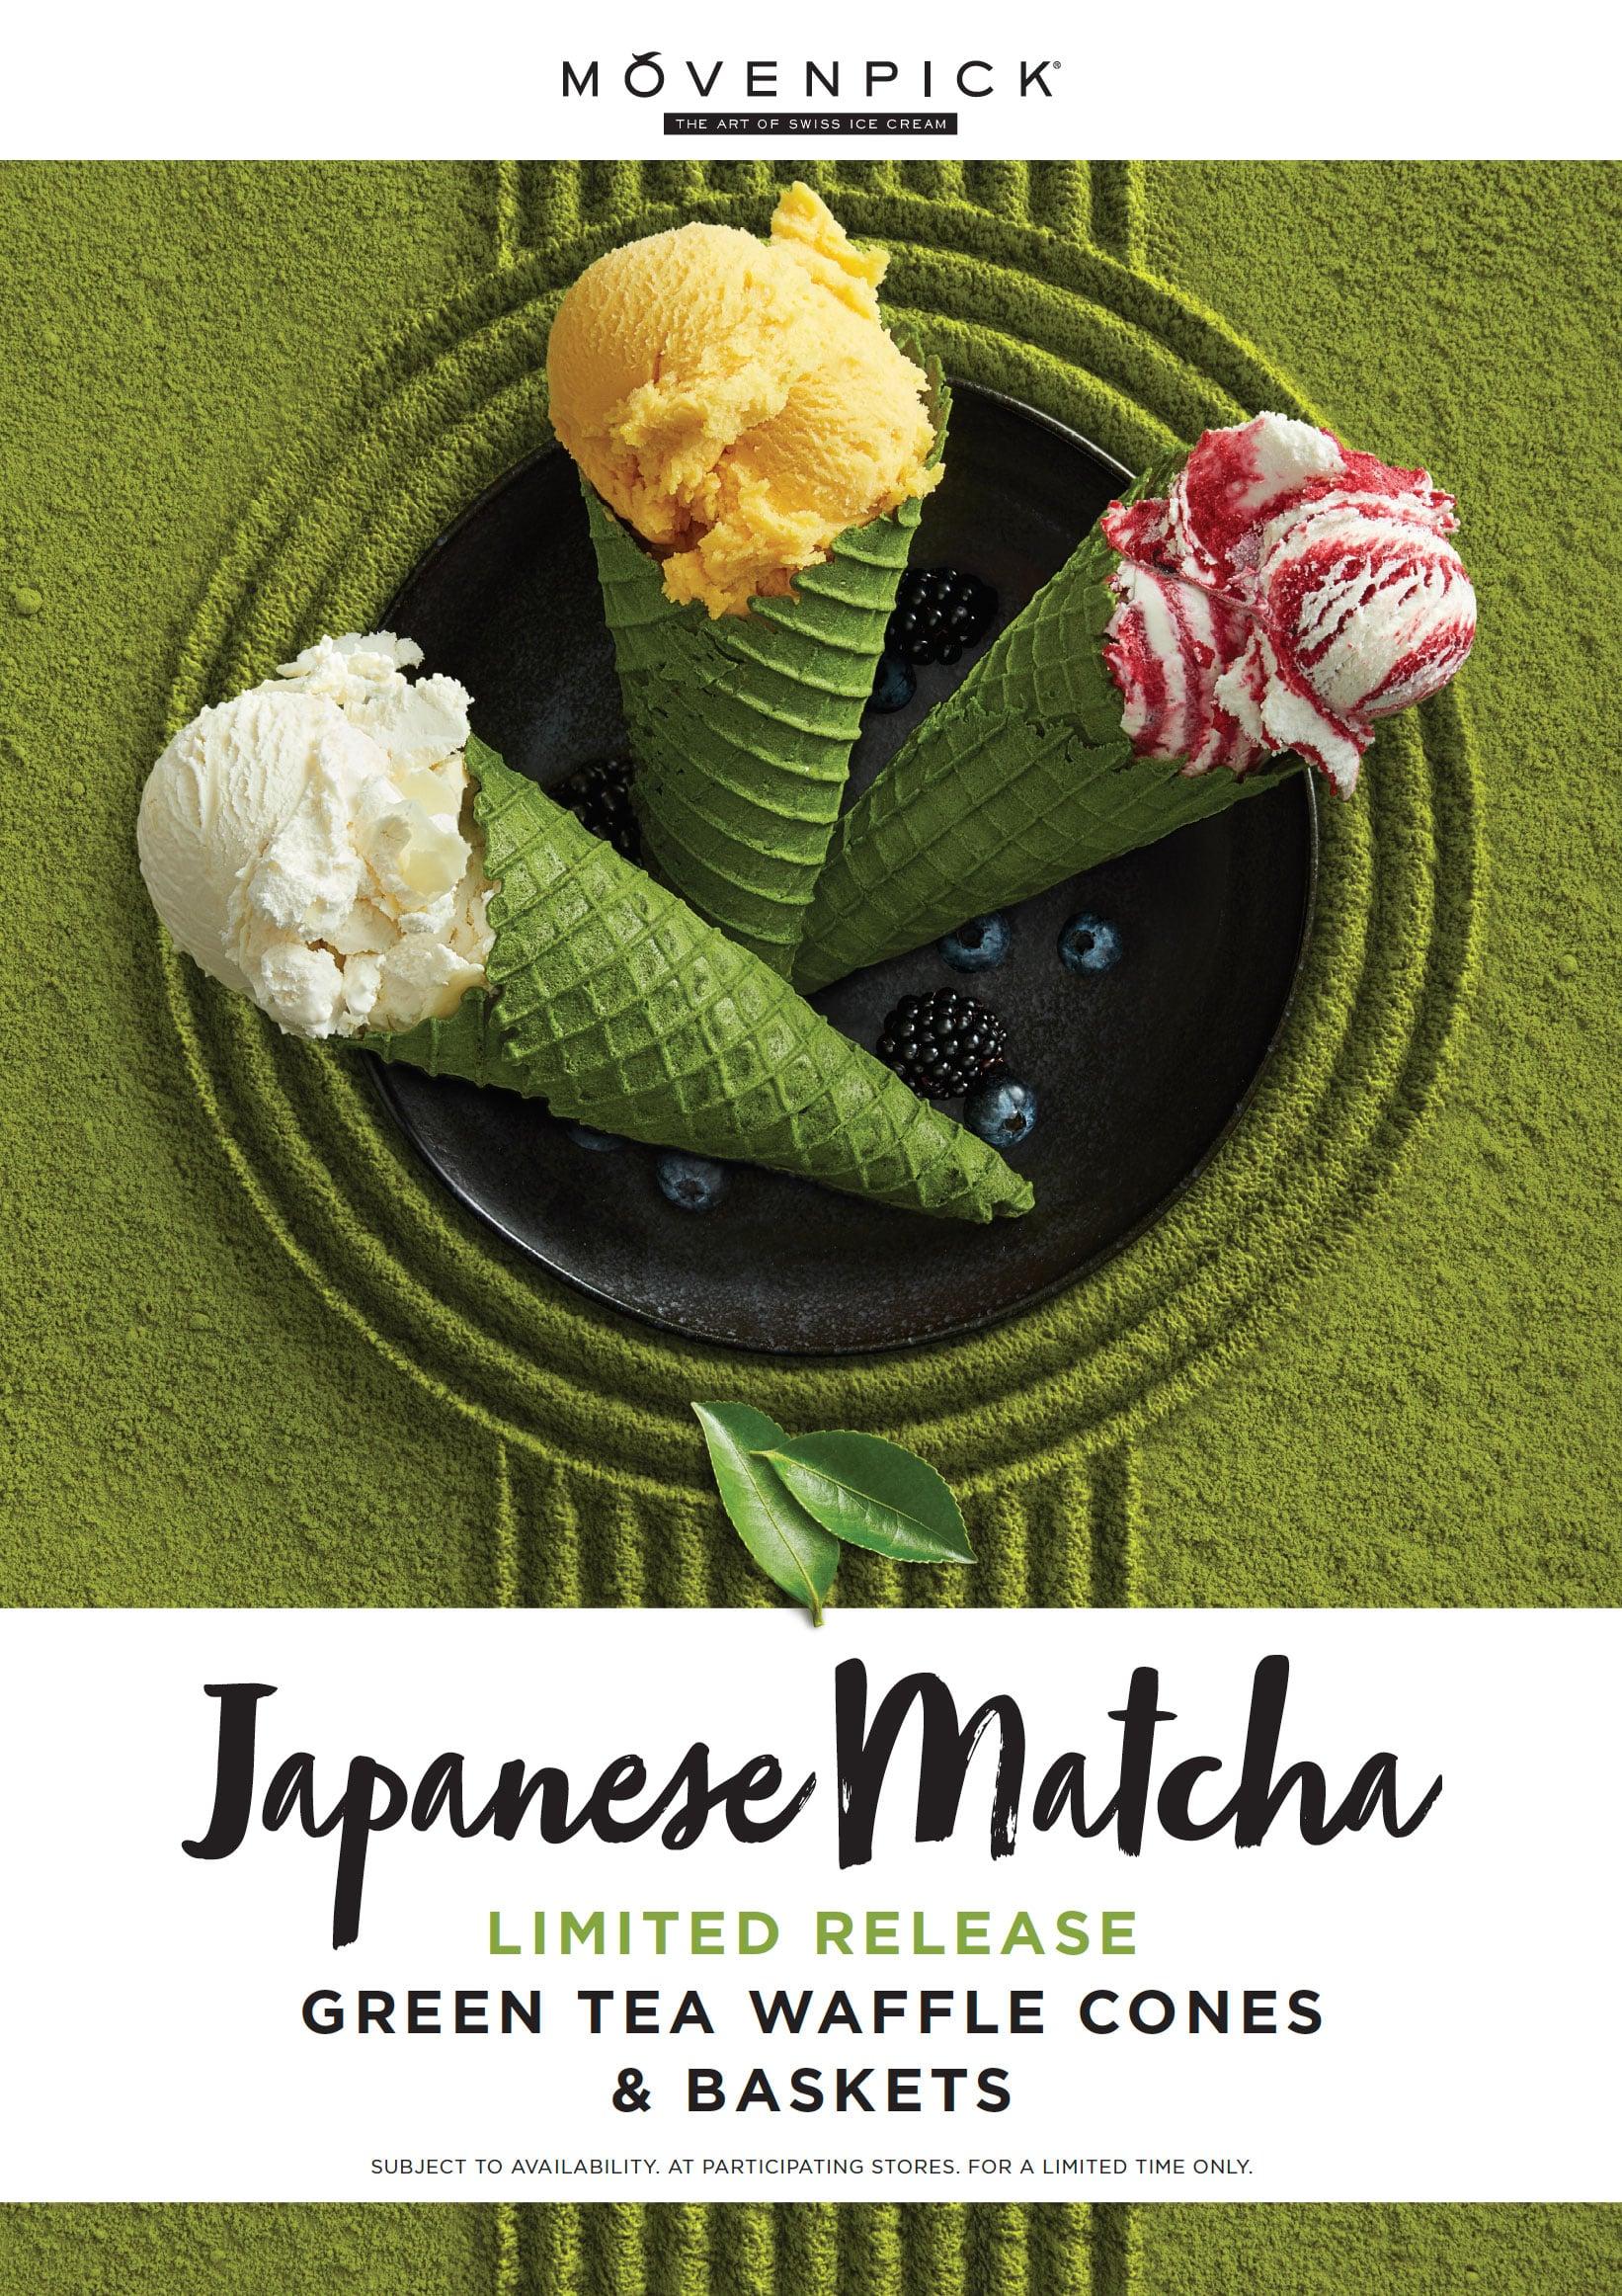 Movenpick Japanese Matcha Ice Cream, FMCG, Advertising, Food styling